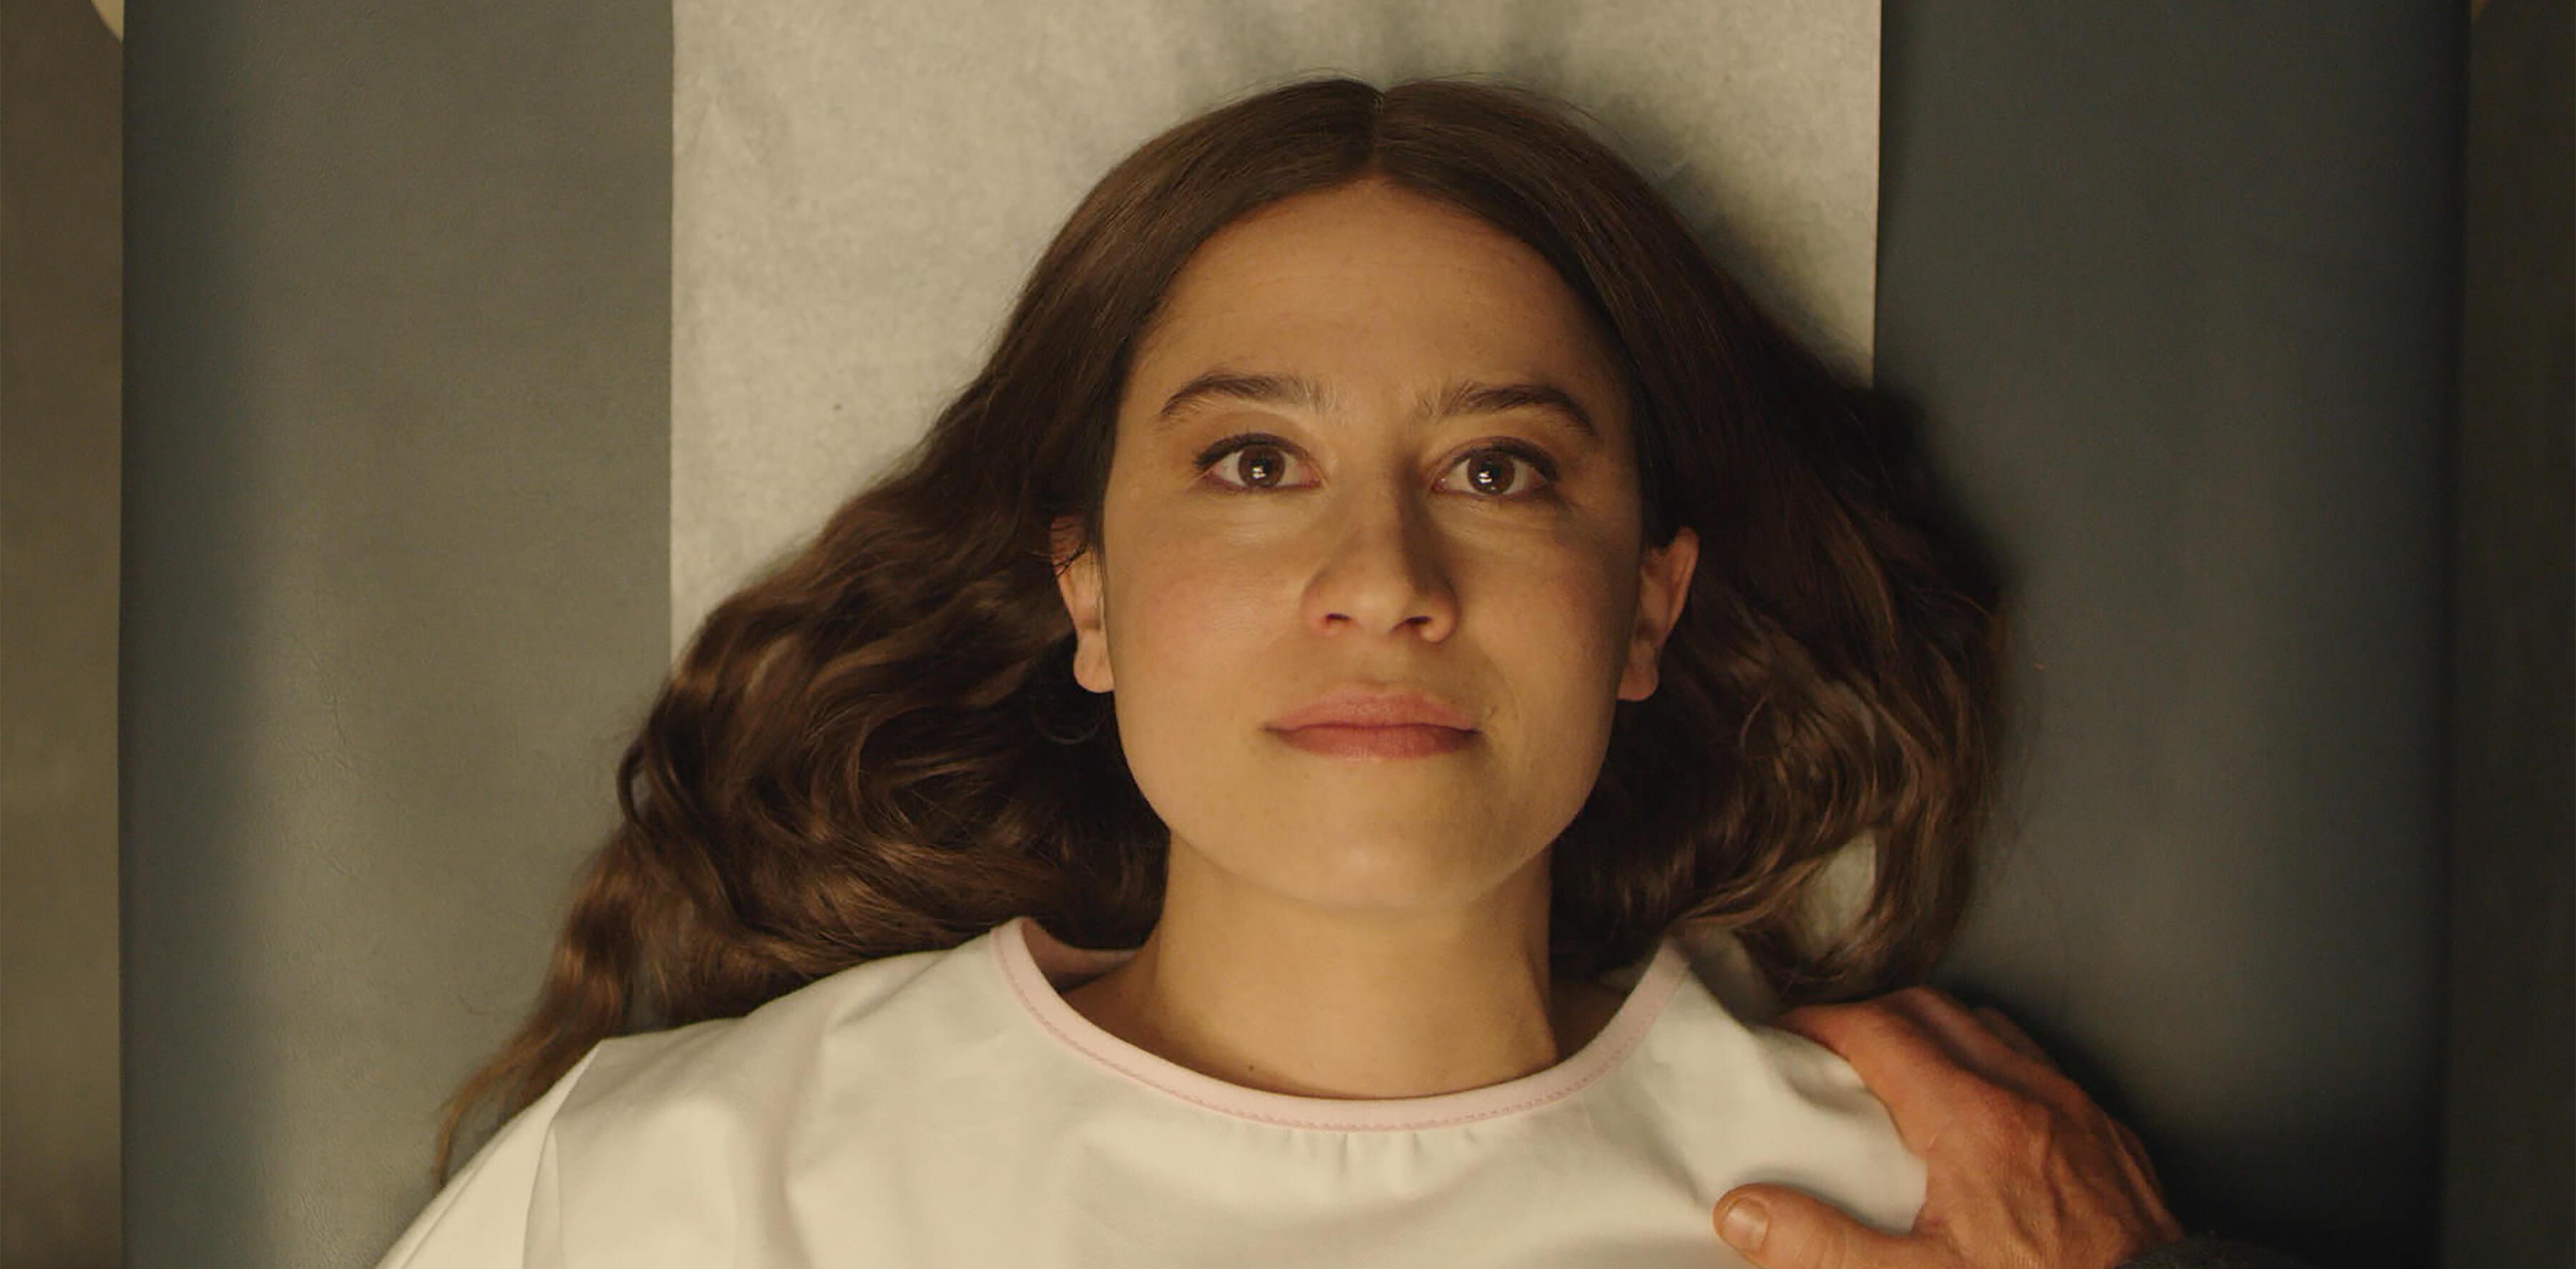 Ilana Glazer plays a mom-to-be in 'False Positive'